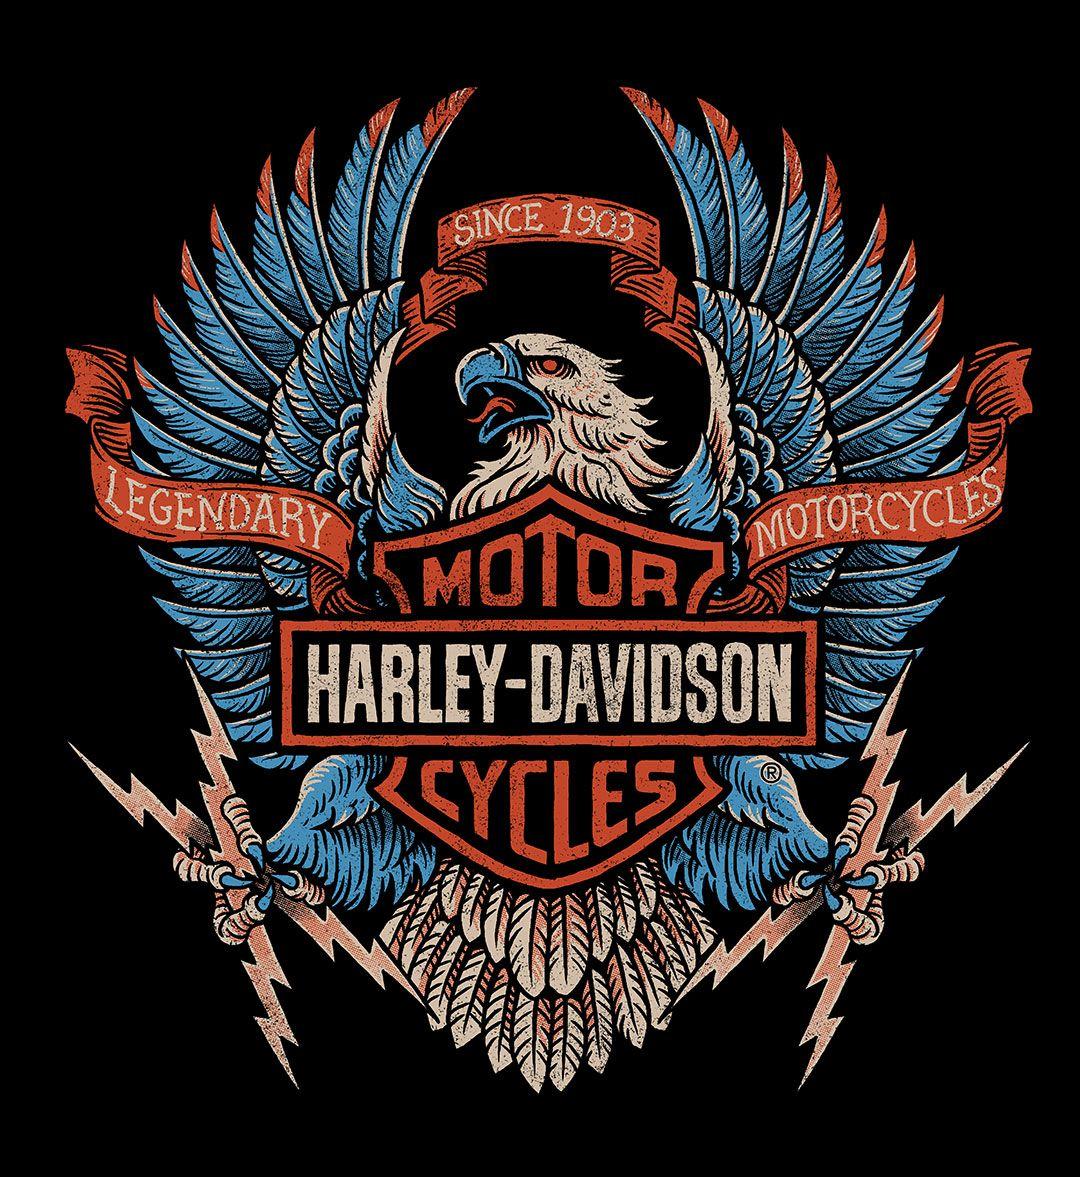 Work Strawcastle Harley Davidson Artwork Harley Davidson Posters Harley Davidson Art